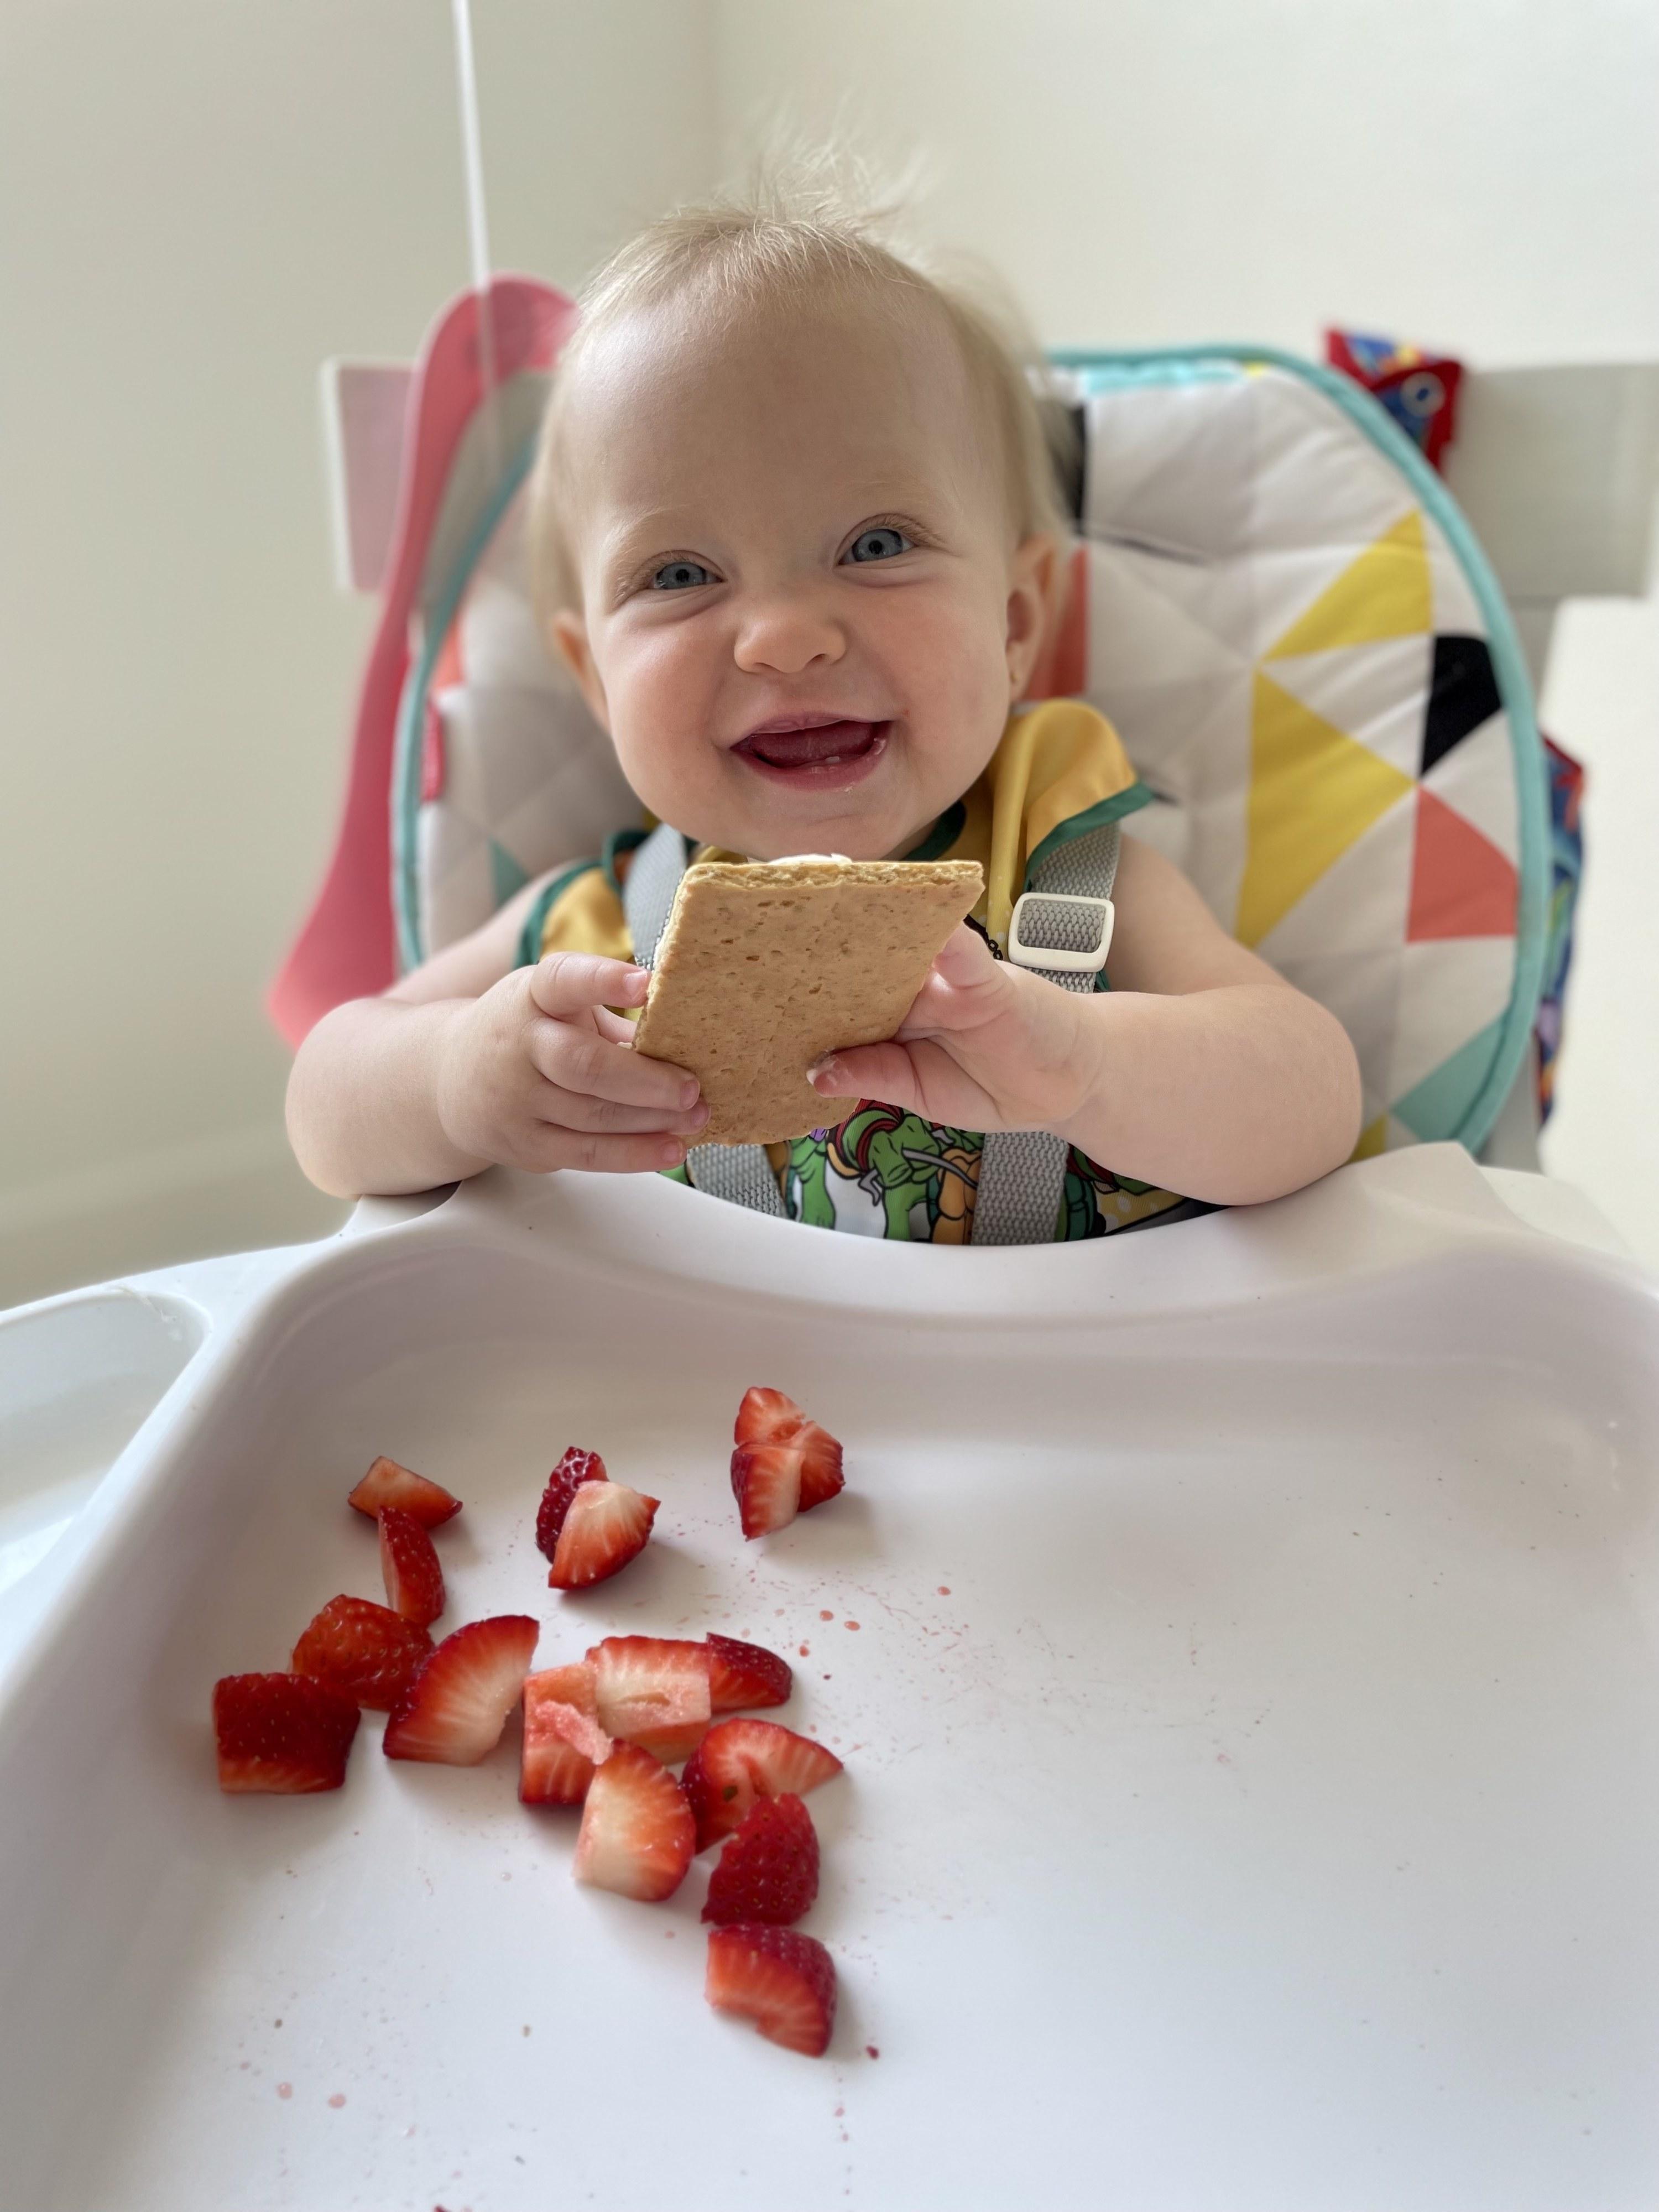 The author's daughter enjoying cheesecake crackers